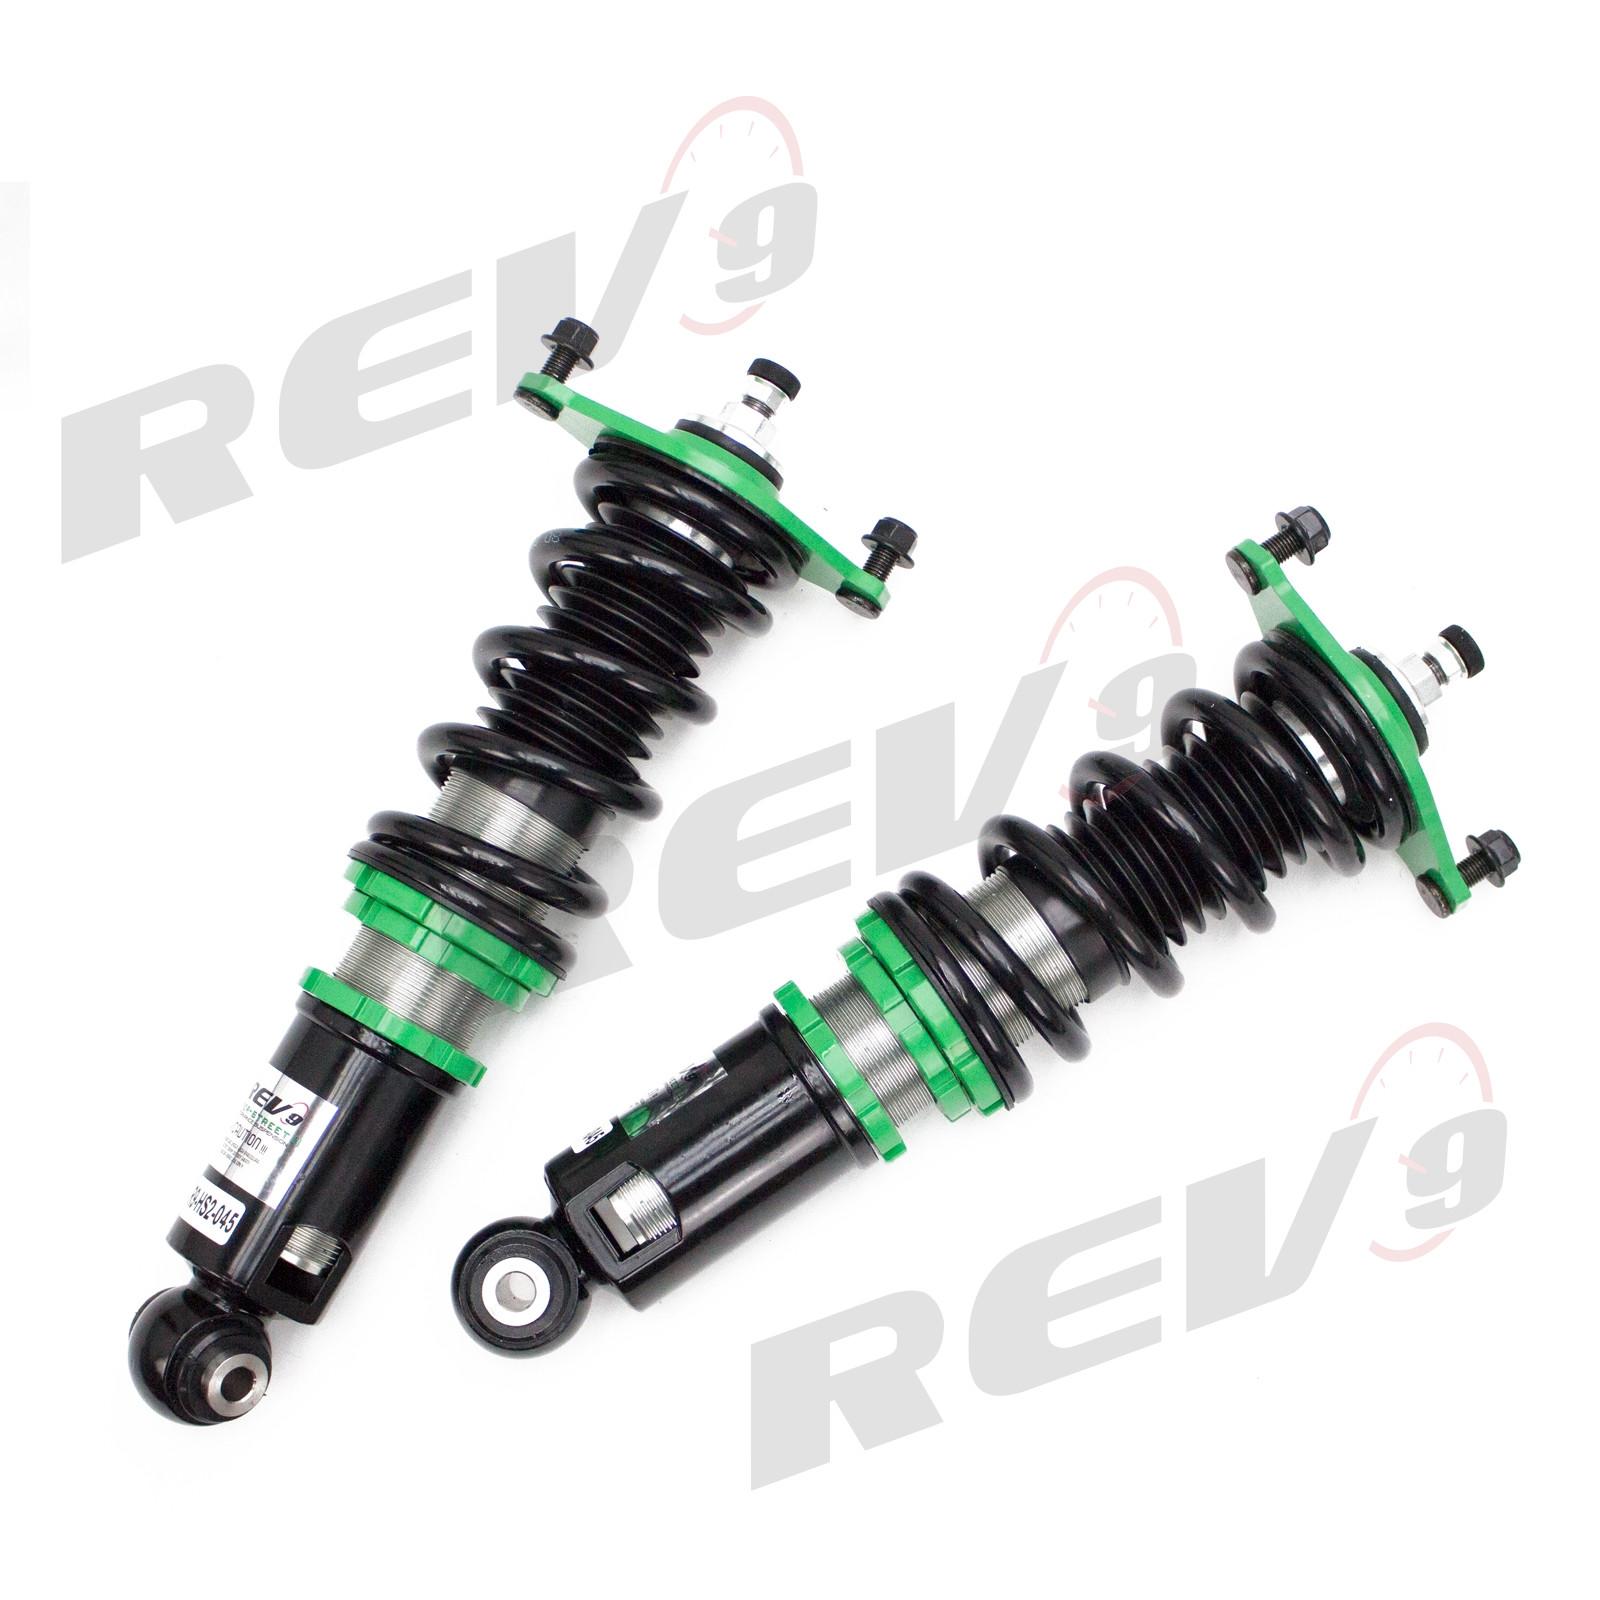 Rev9power Hyper Street 2 Coilover Dampers Subaru Impreza